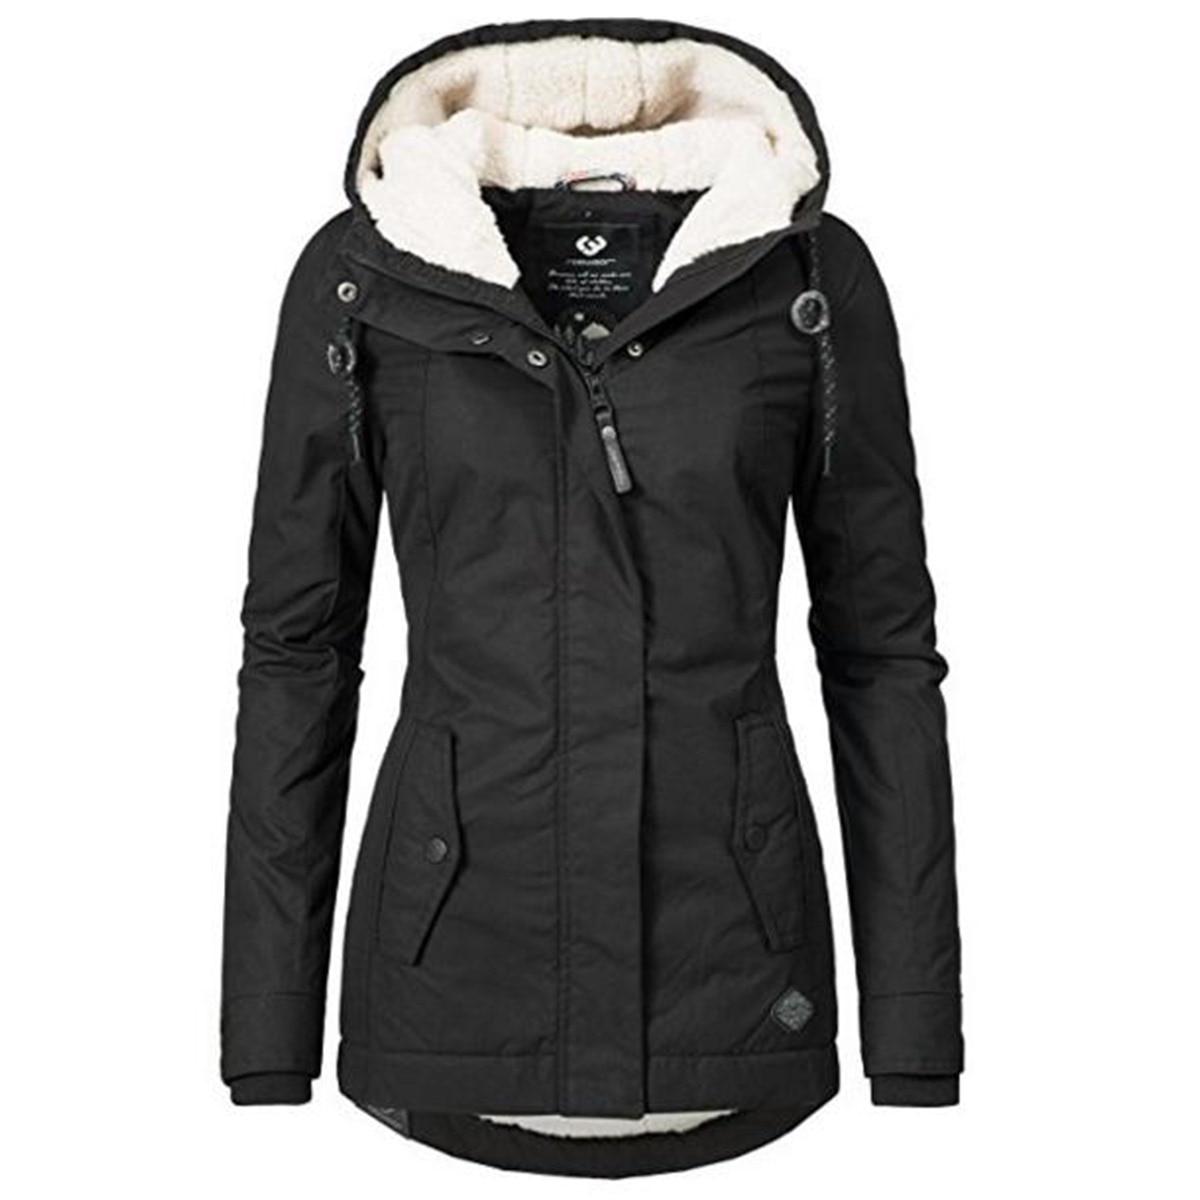 Black Cotton Coats Women Casual Hooded Jacket Coat Fashion Simple High Street Slim 2019 Winter Warm Thicken Basic Tops Female